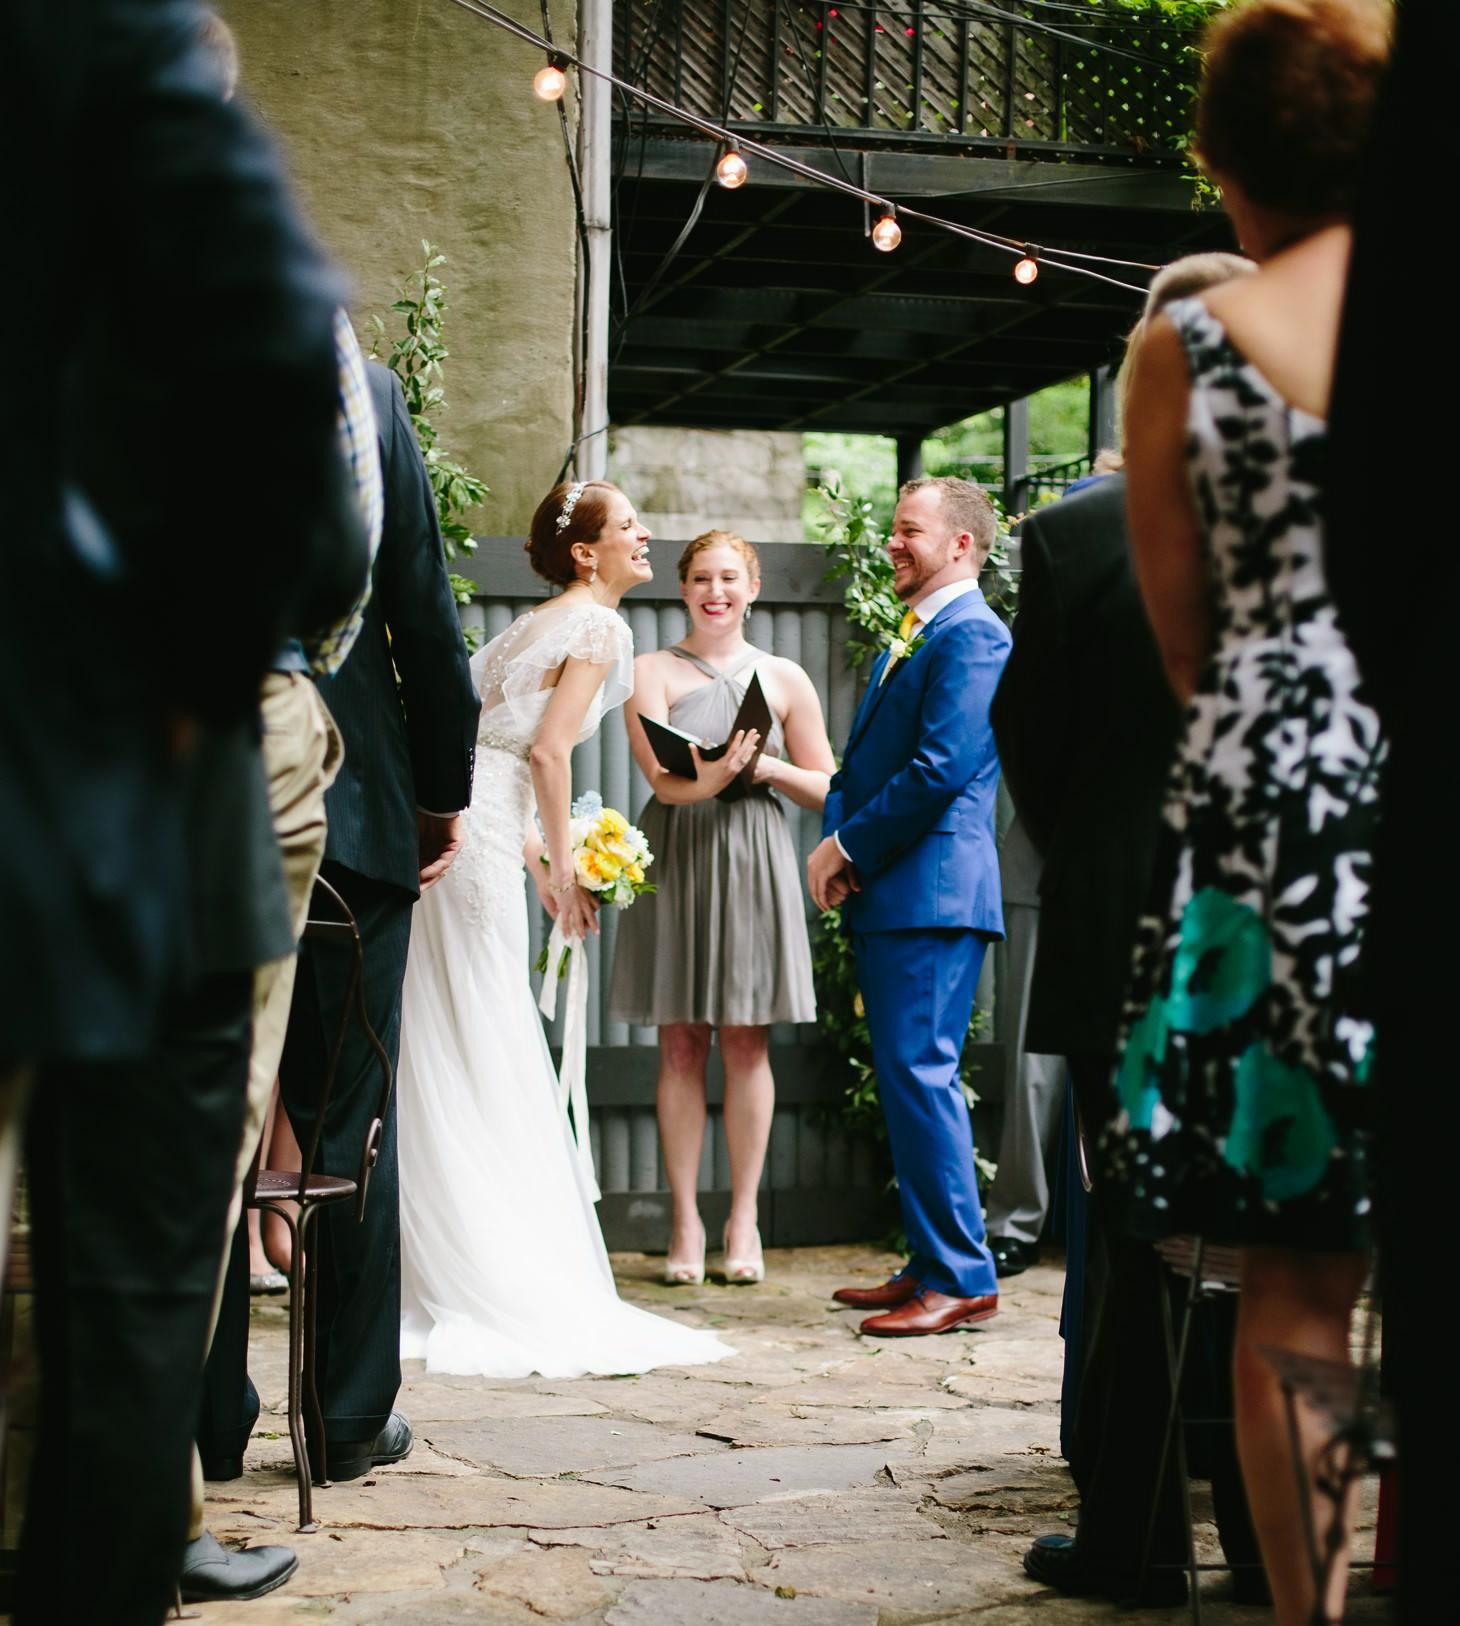 022-nyc-wedding-photographer-brooklyn-restaurant-2.jpg